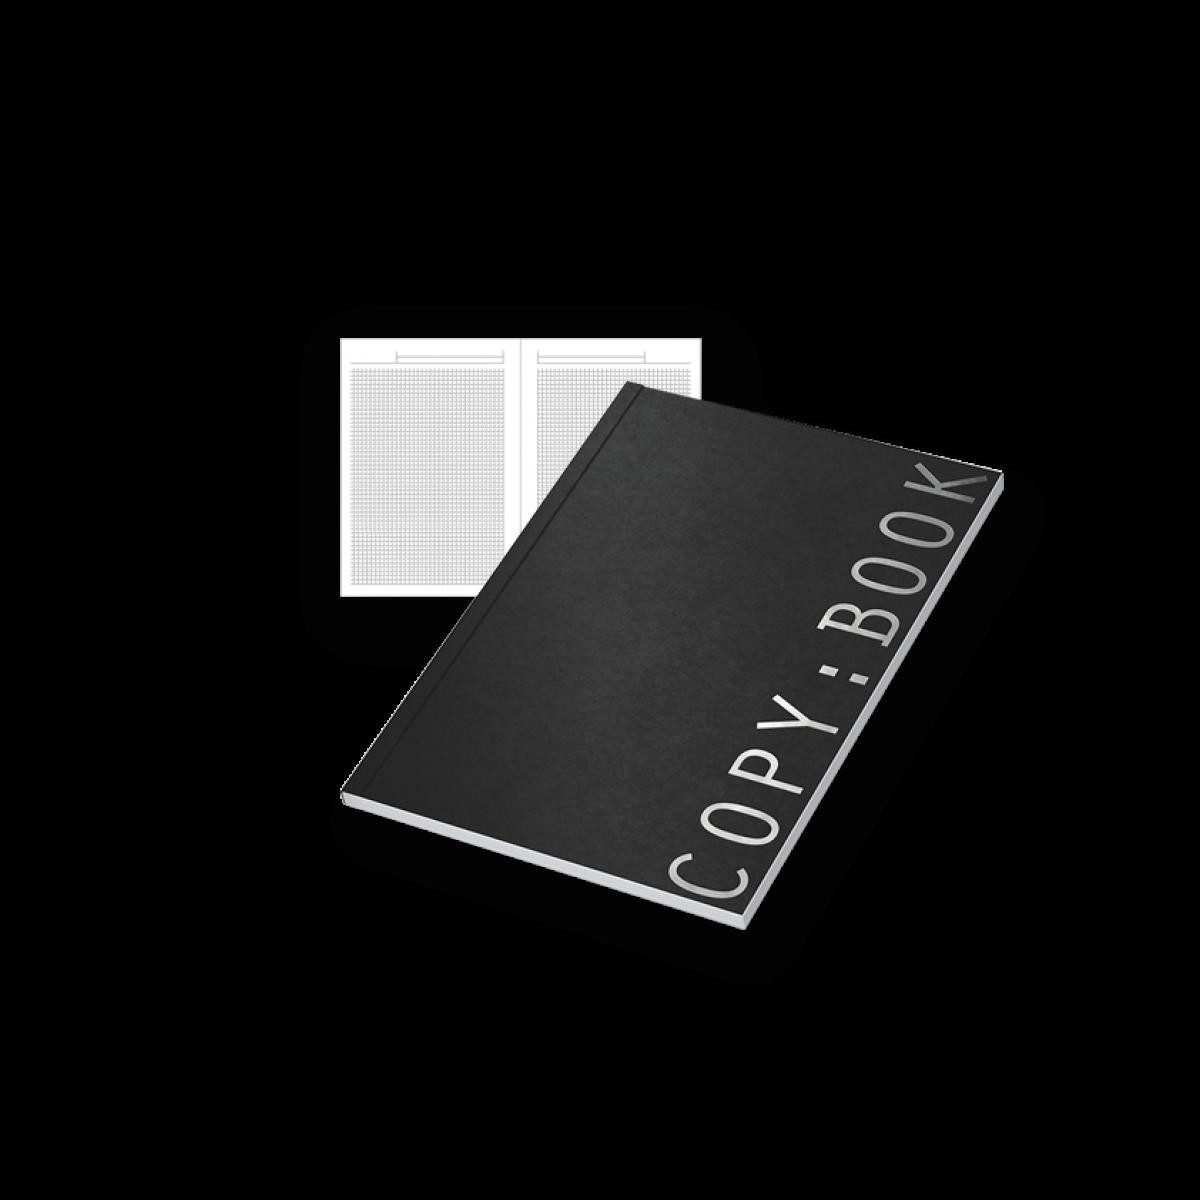 Notizbuch Modell Copy-Book